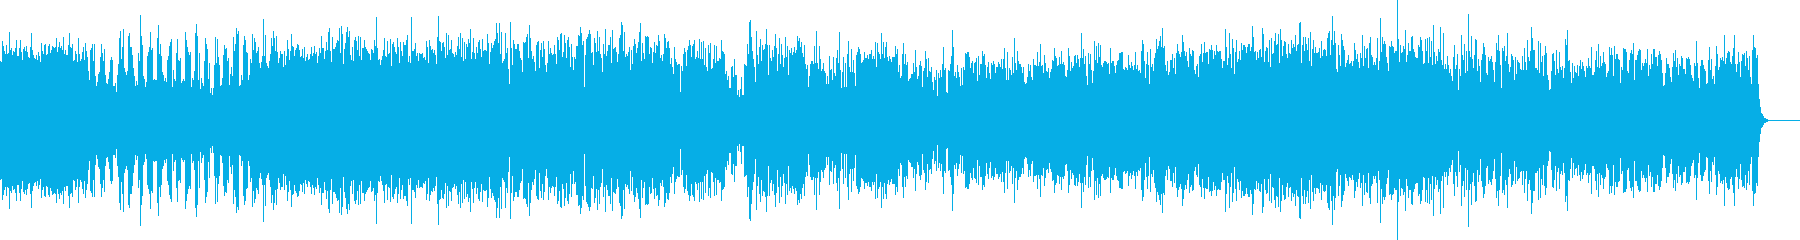 AMGアナログFX 17の再生済みの波形